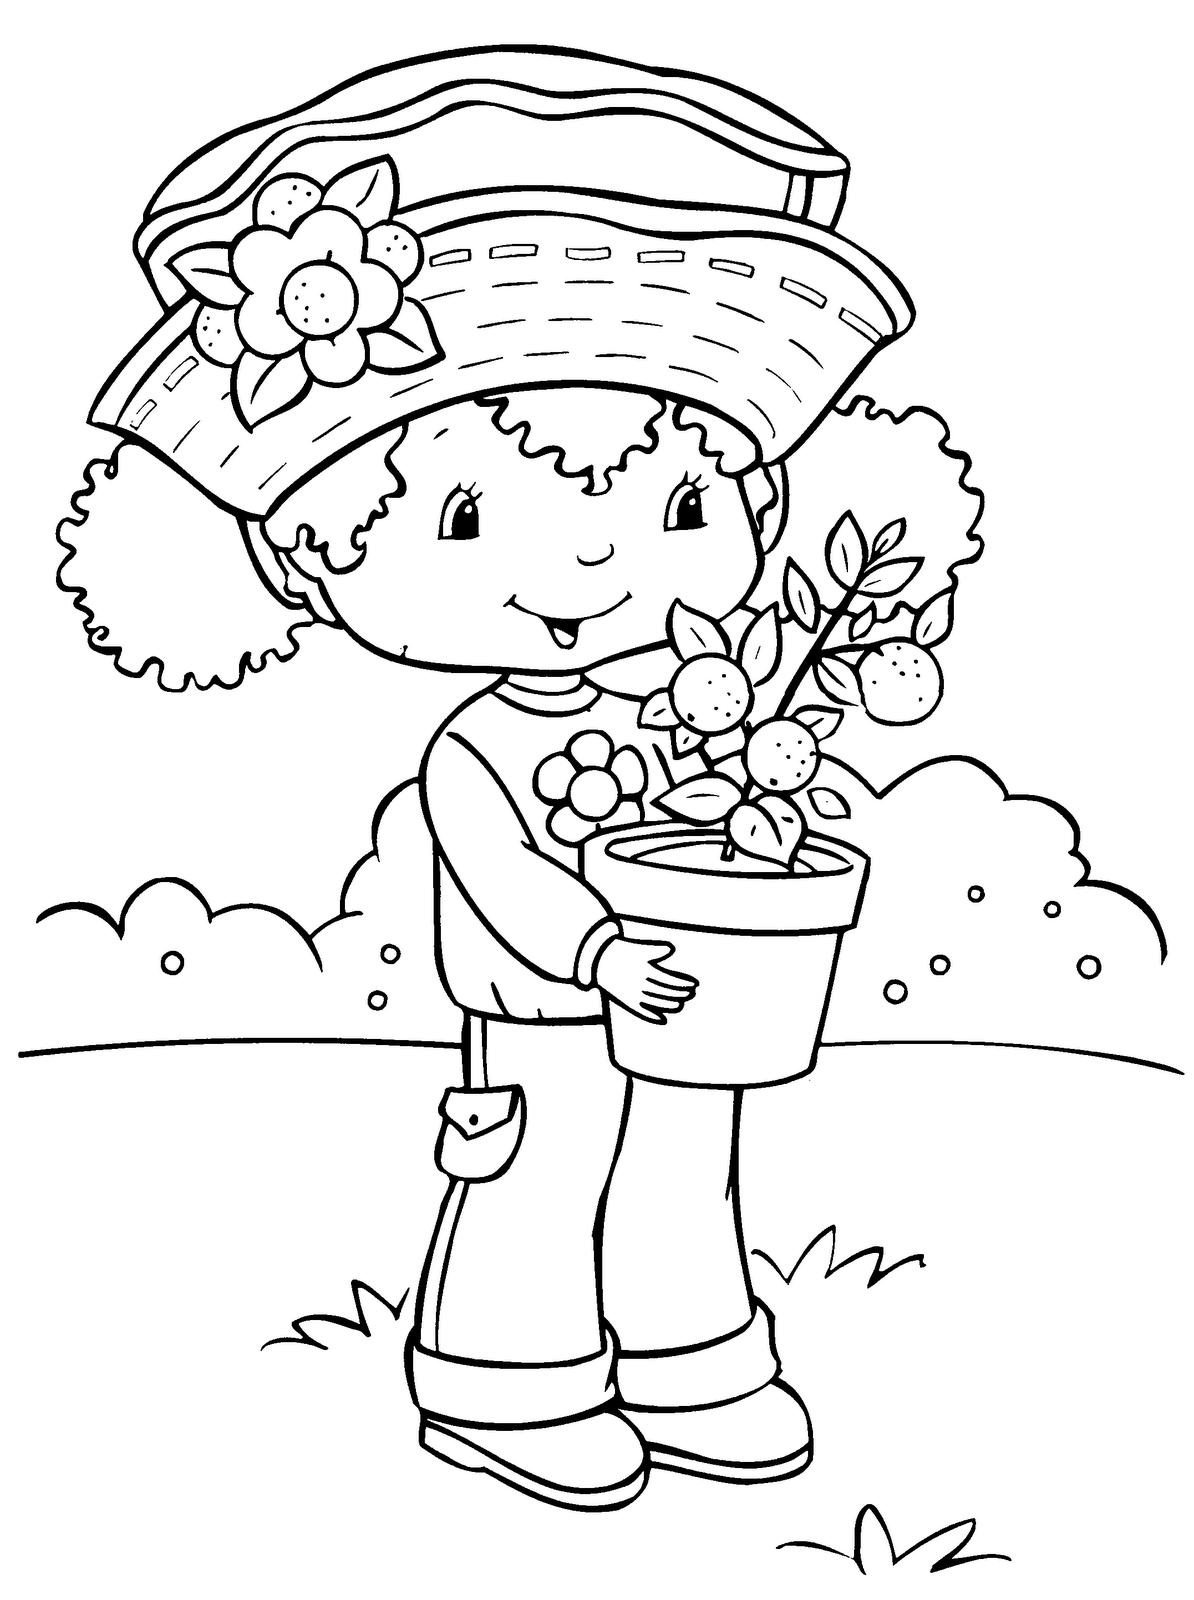 Dibujos para colorear Mueca Tarta de fresa con maceta para